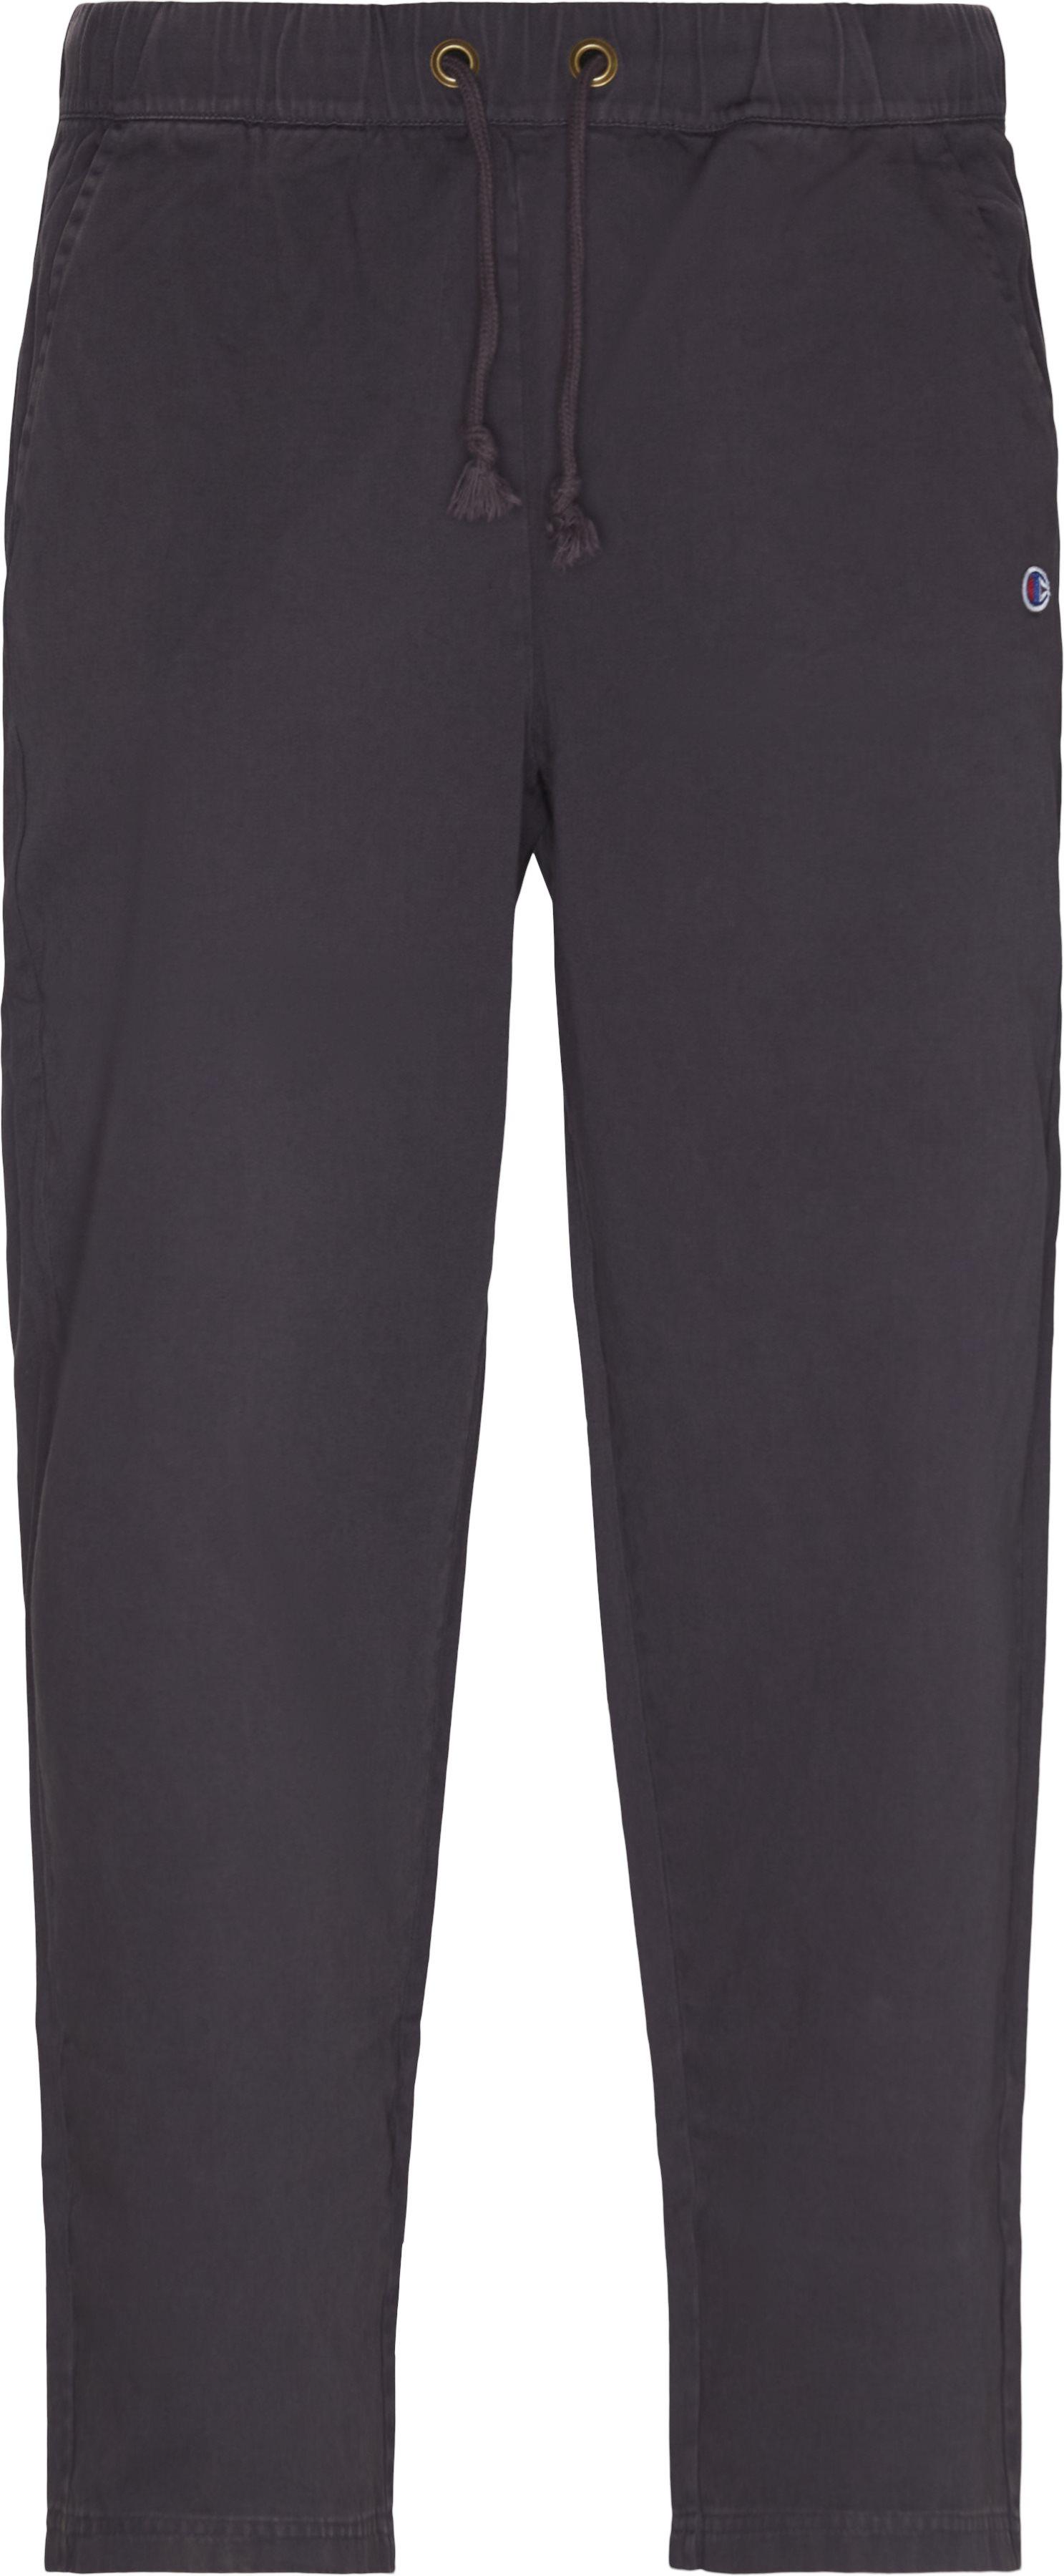 Logo Comfort Pant - Byxor - Loose fit - Grå